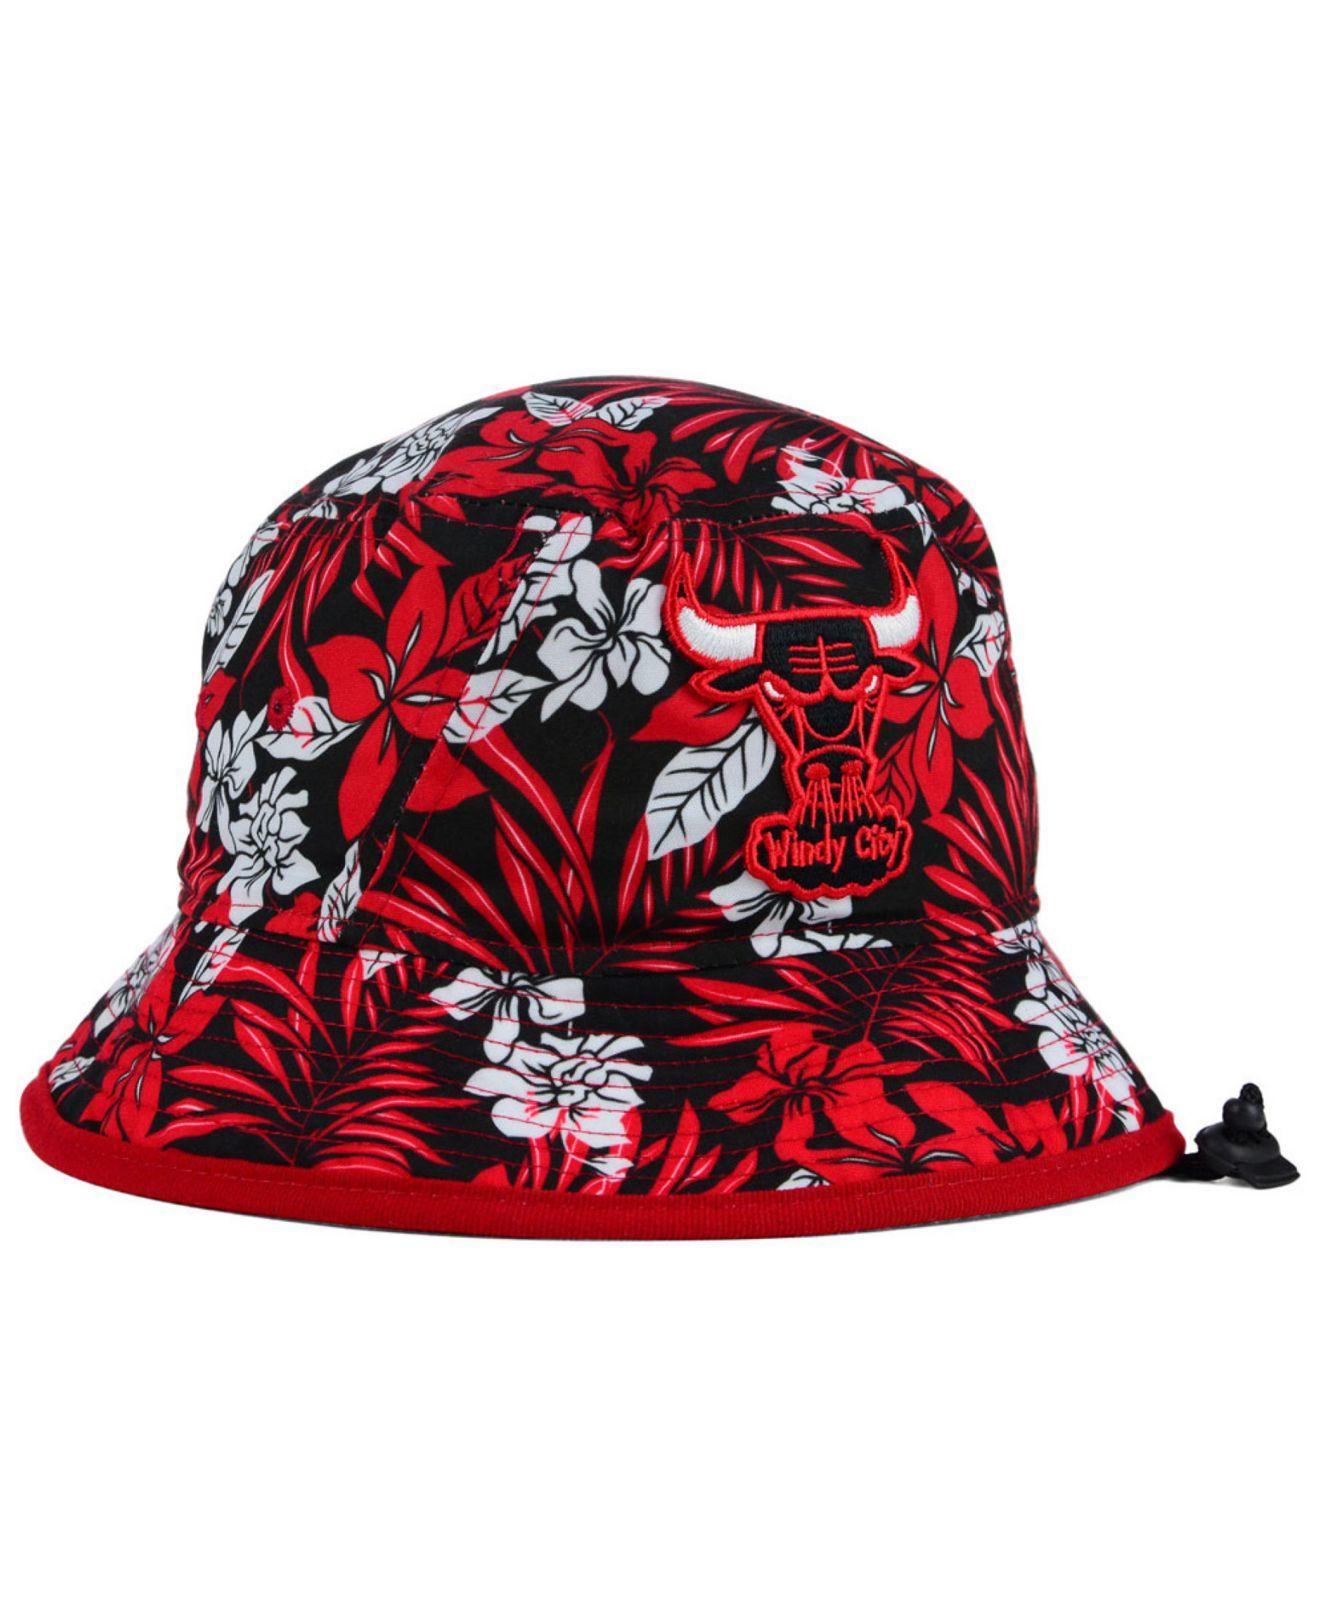 84d9d0378e1 ... spain lyst ktz chicago bulls wowie bucket hat in red for men de59d a0158